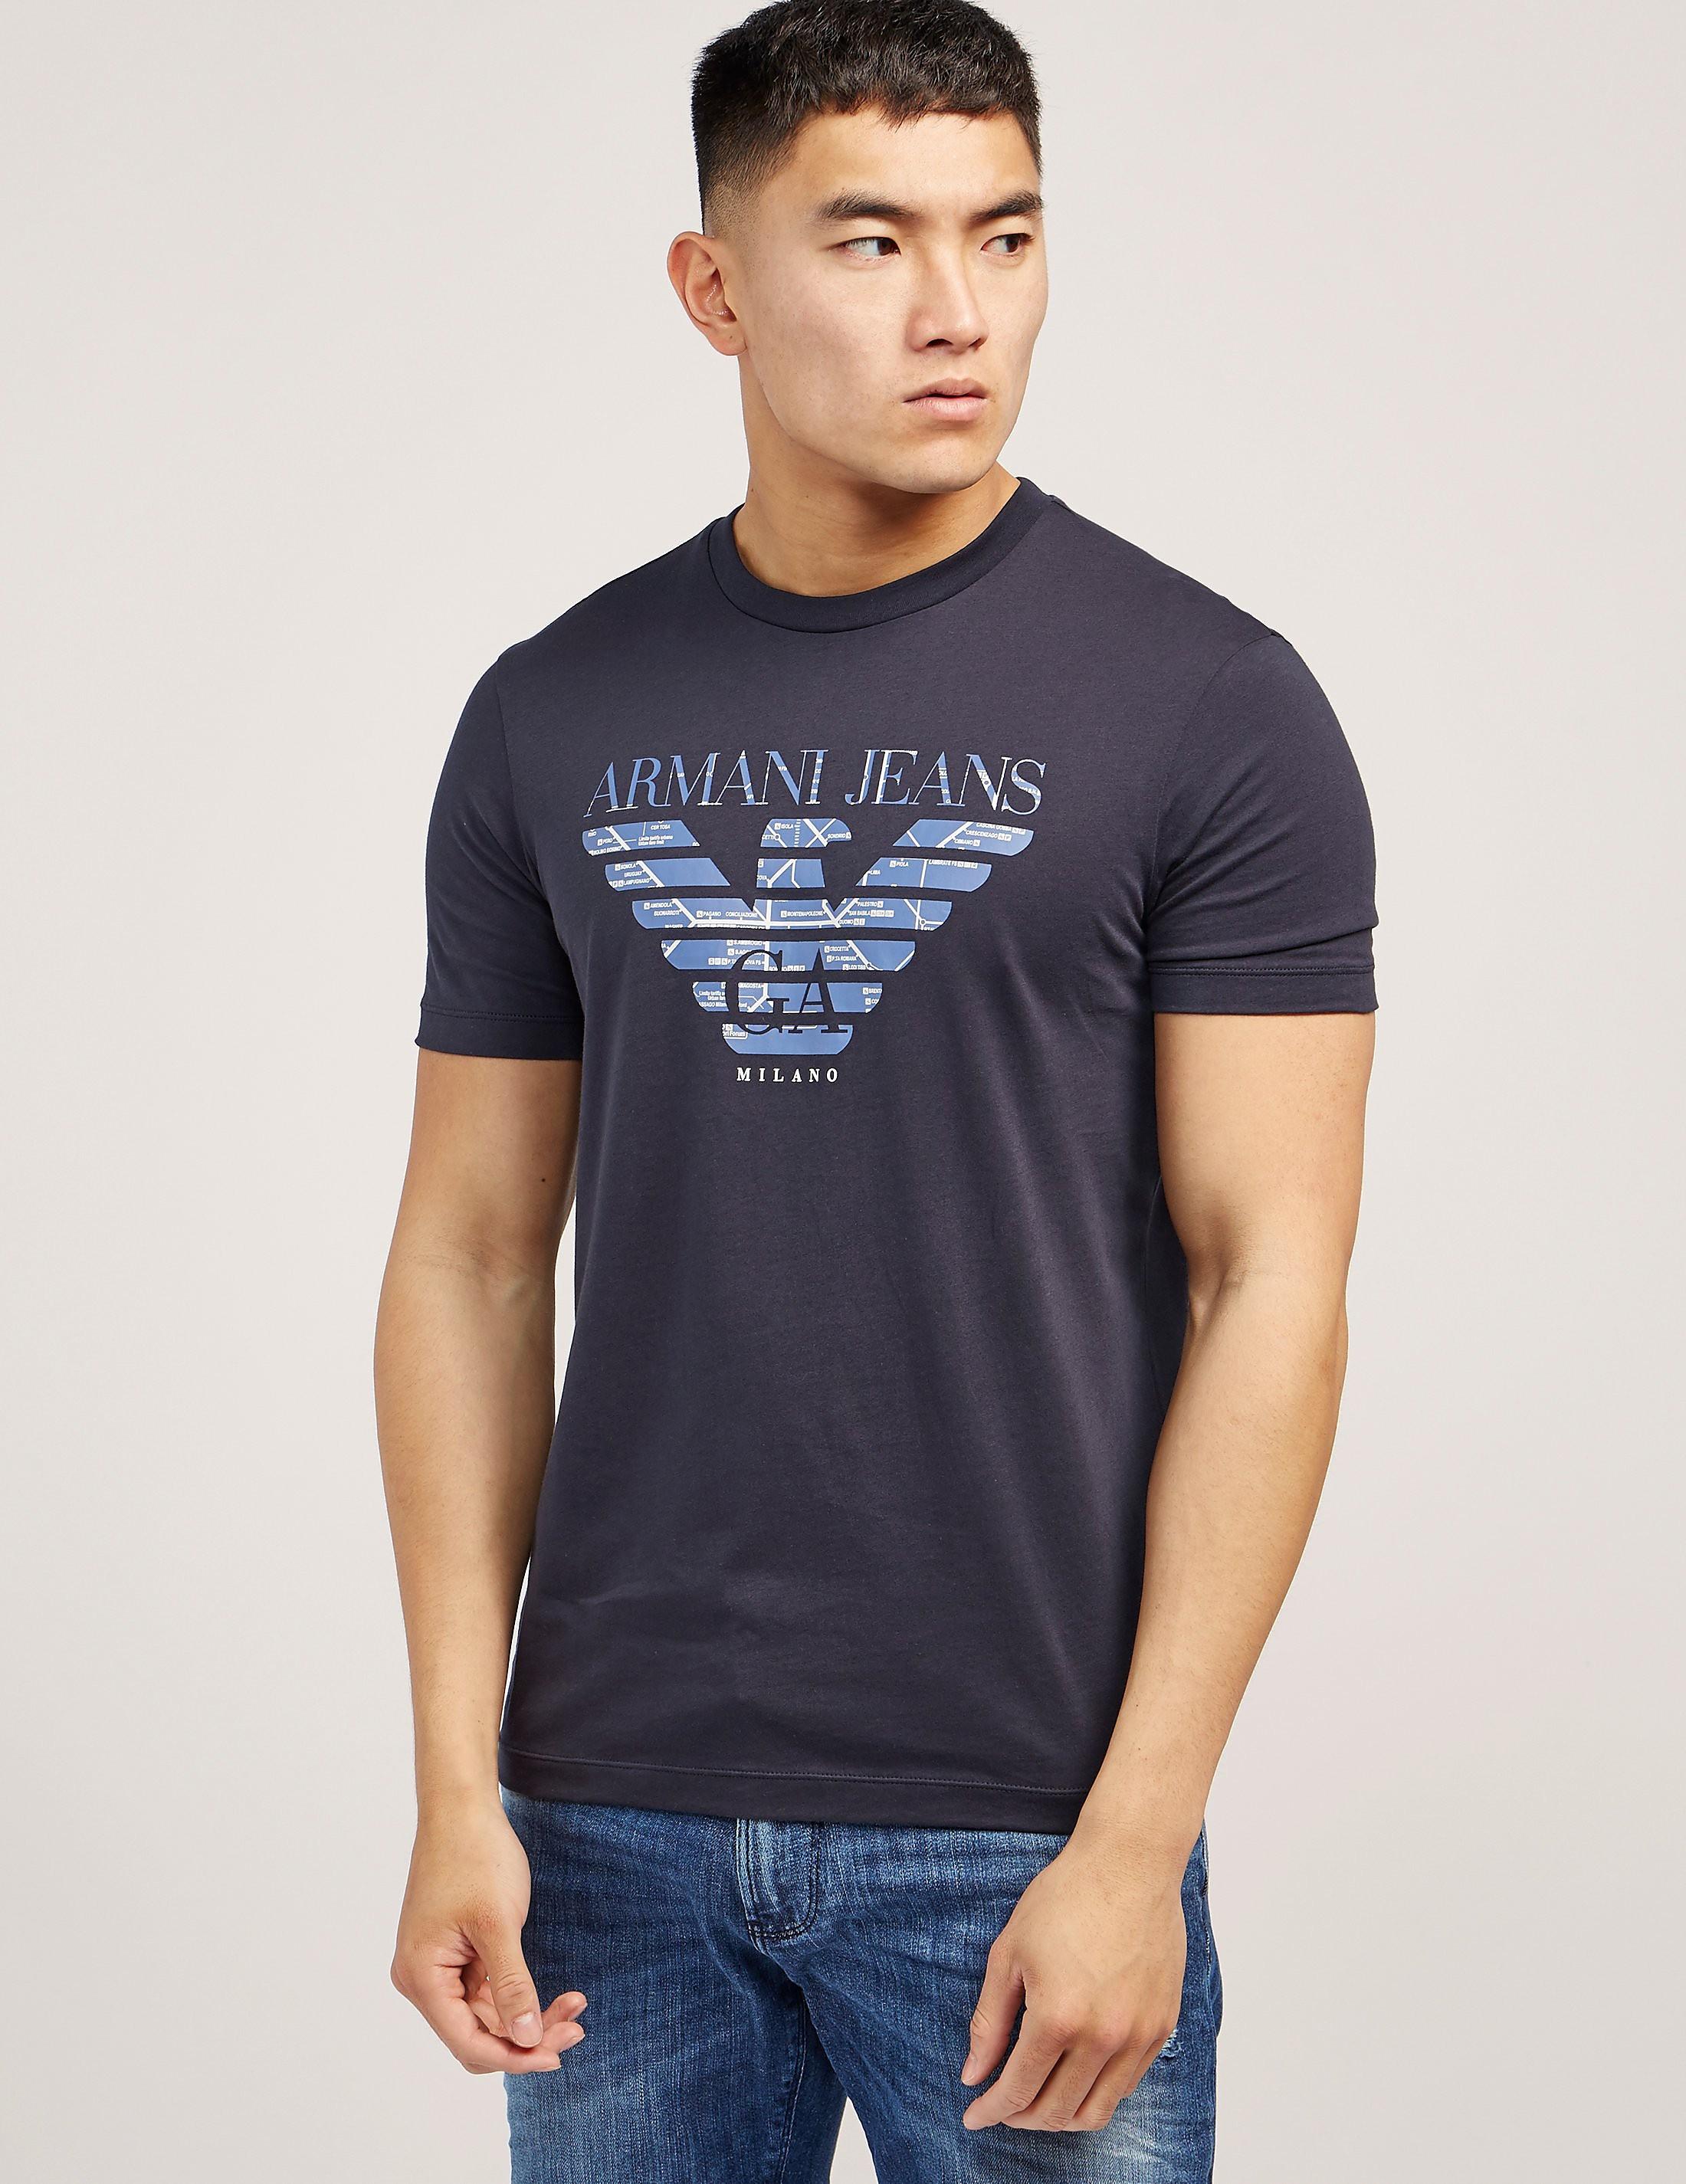 Armani Jeans Large Eagle Logo Short Sleeve T-Shirt